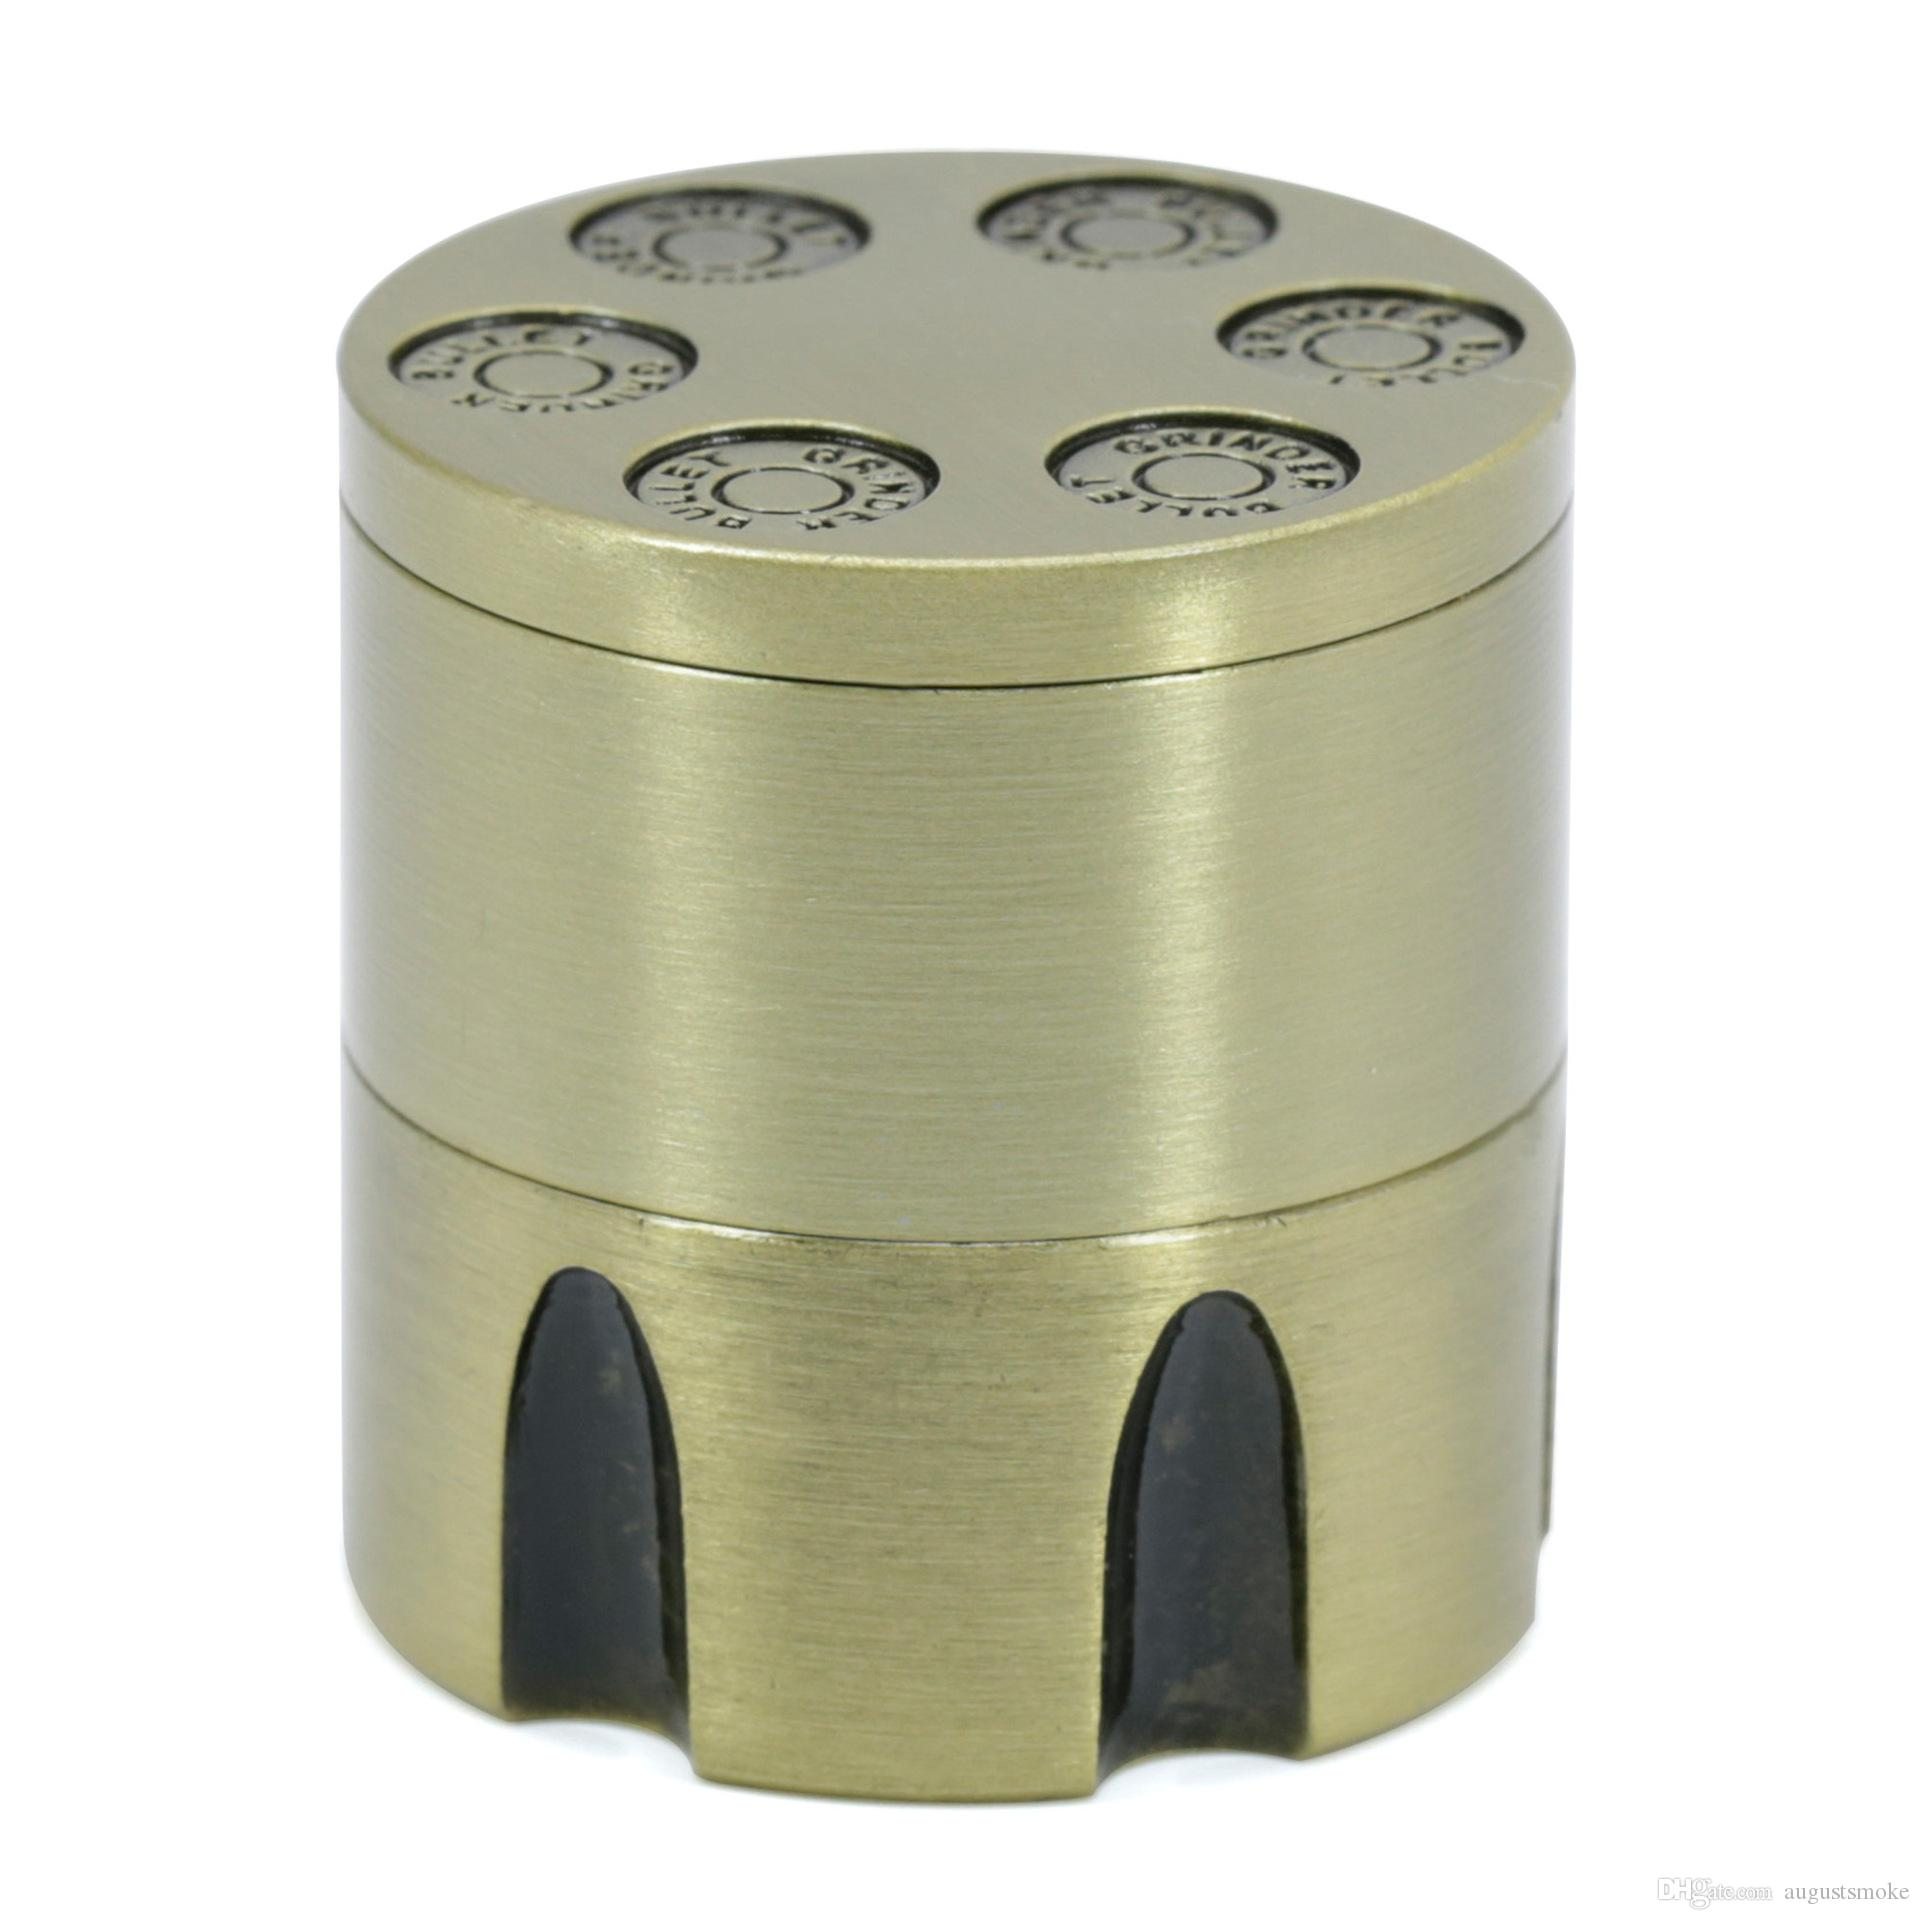 Bullet Hot New Diametro Diametro 30 3 mm Style in lega di zinco Grinder Grinder Vendita Revoluzione Bronzo Pezzo Grinder 4411-30 FFMQP